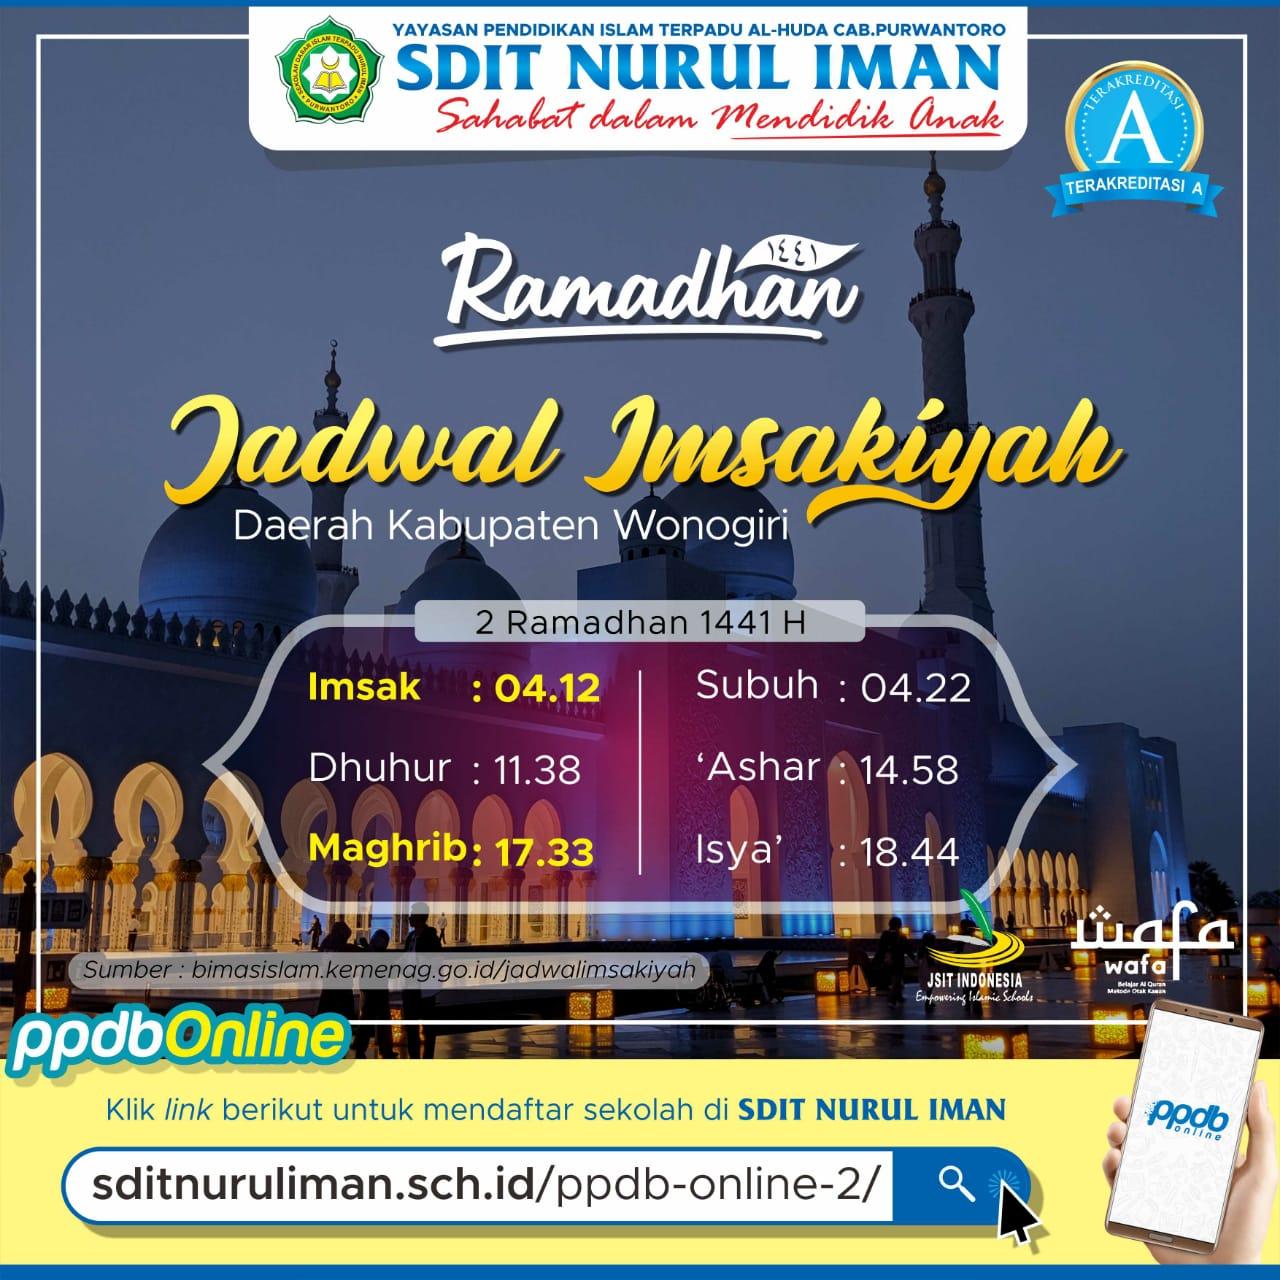 2 Ramadhan 1441 H